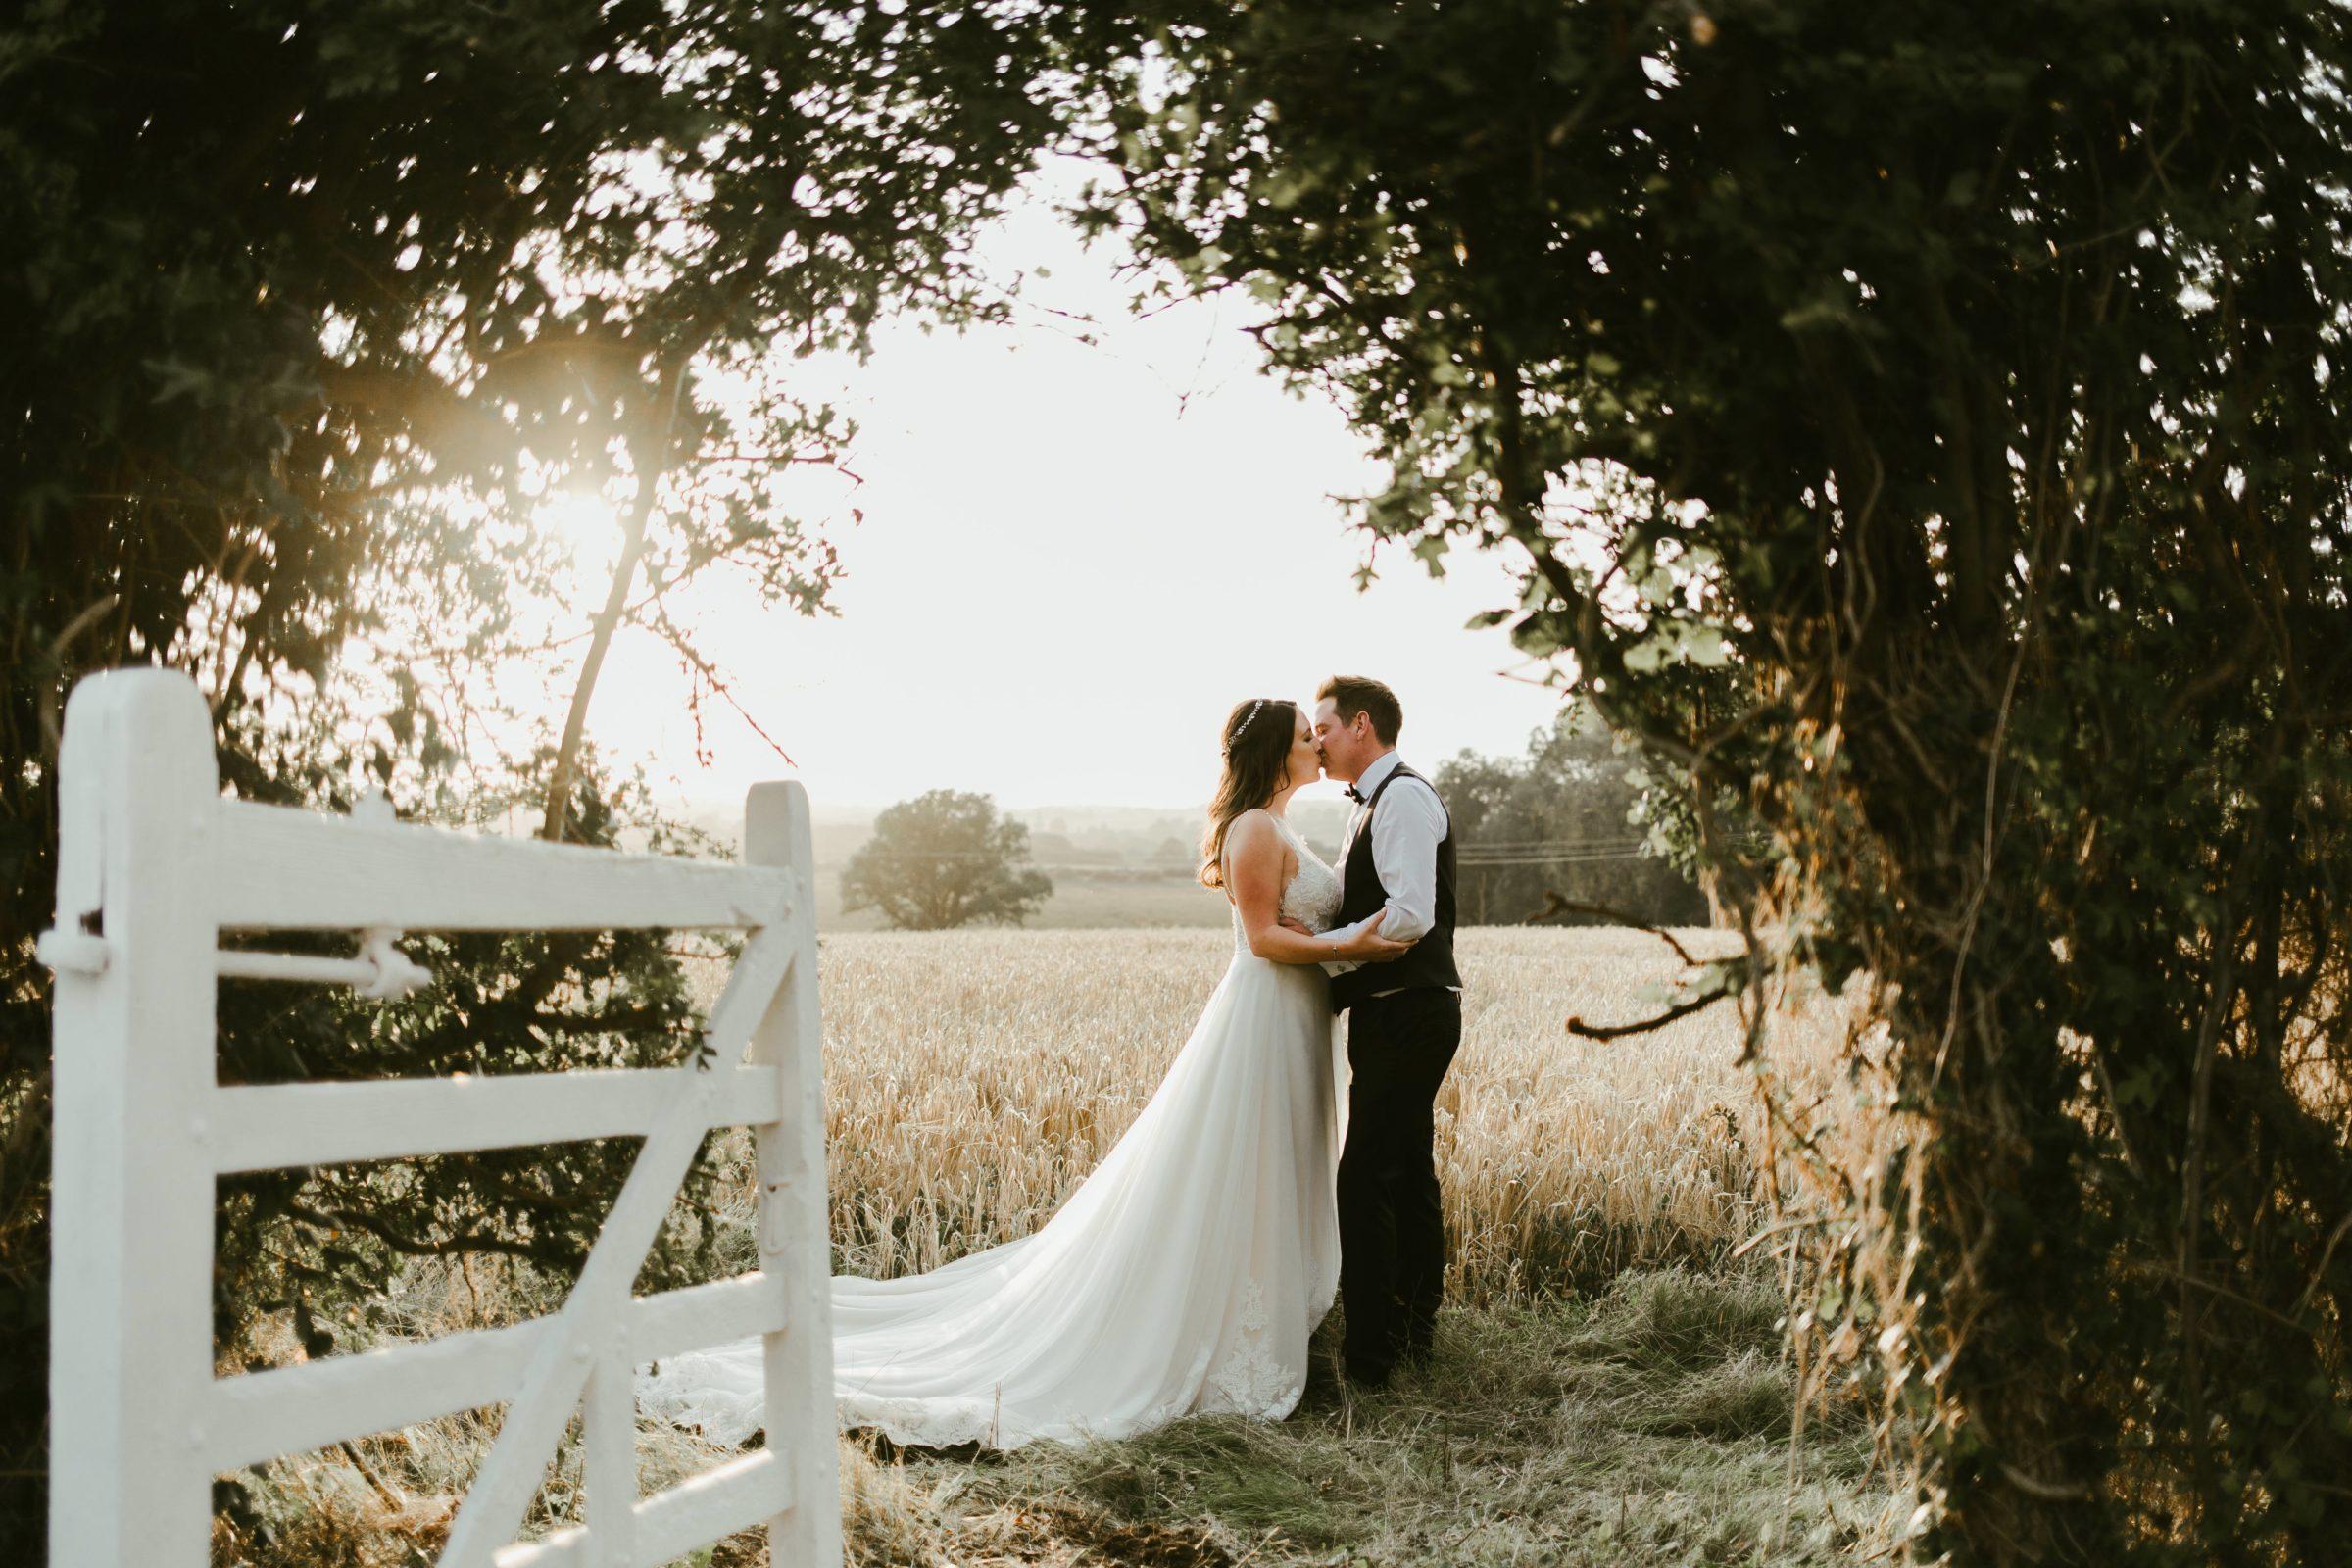 romantic-wedding-photography-photographer-uk-golden-hour-couple